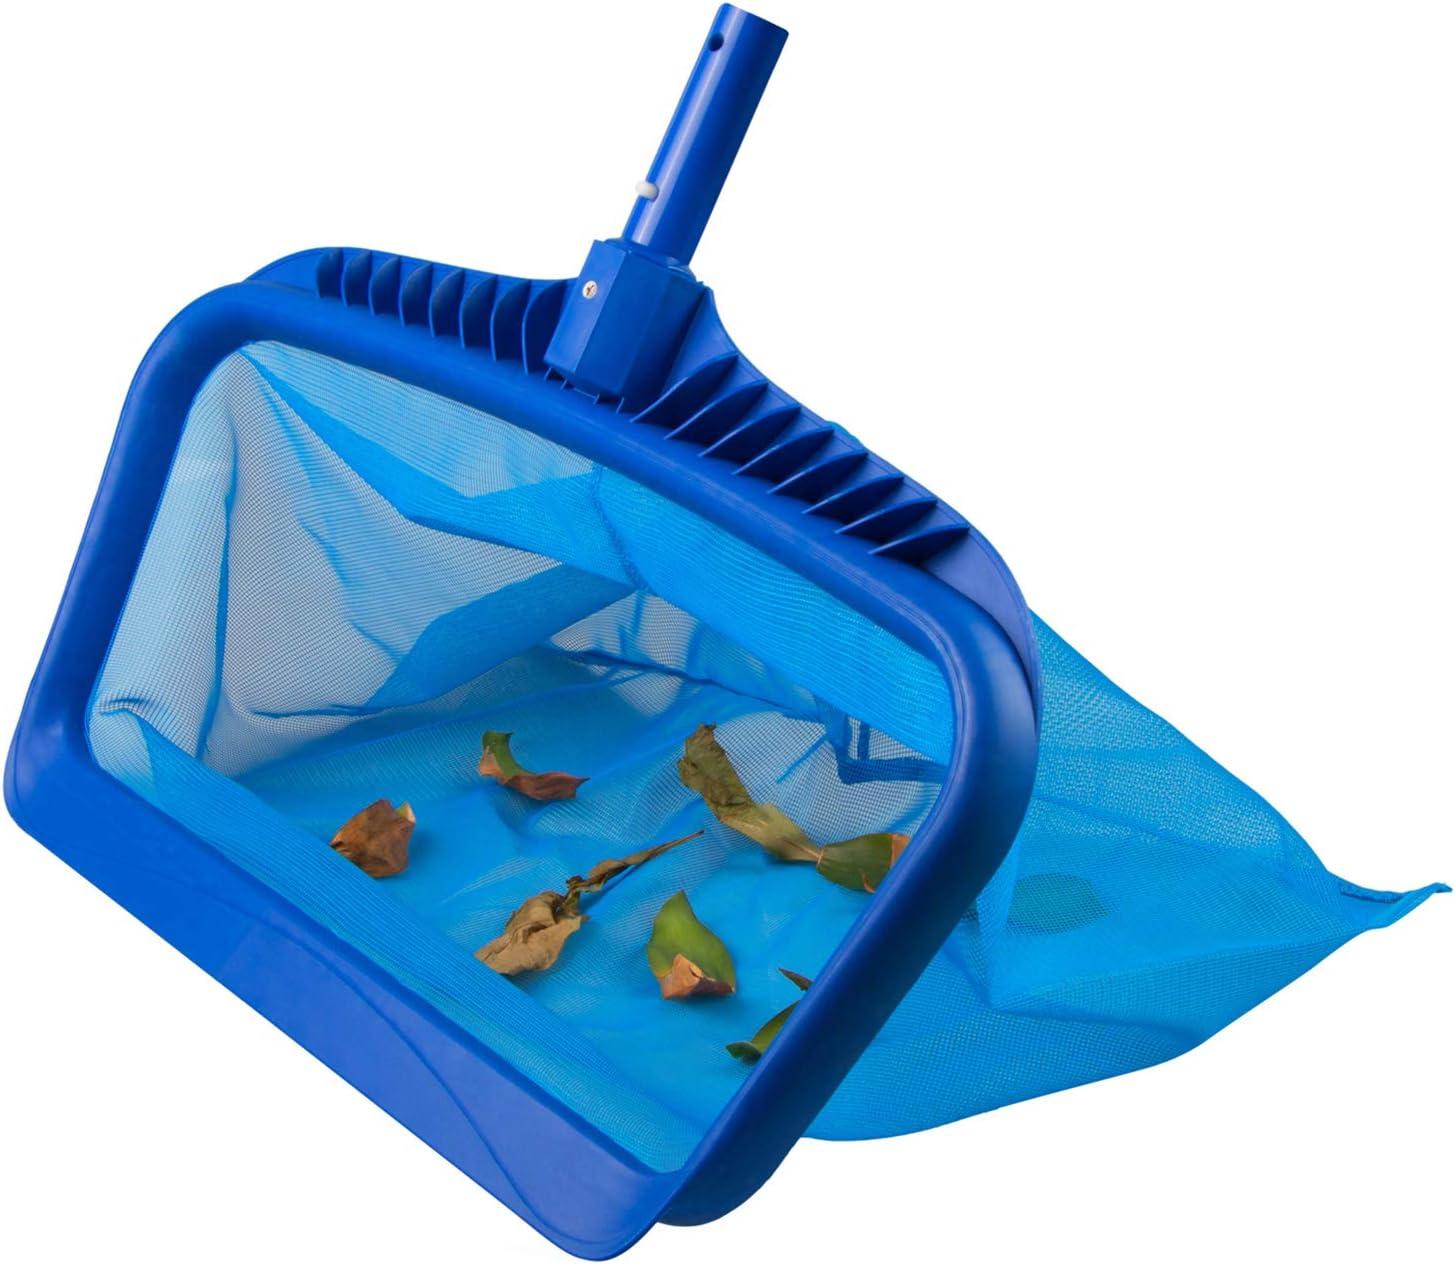 Angozo Pool Skimmer Net Heavy Duty Pool Leaf Rake for Cleaning Swimming Pool koi Pond and Fountain Fine Mesh Bag Catcher Cleaning Leaf Skim Net